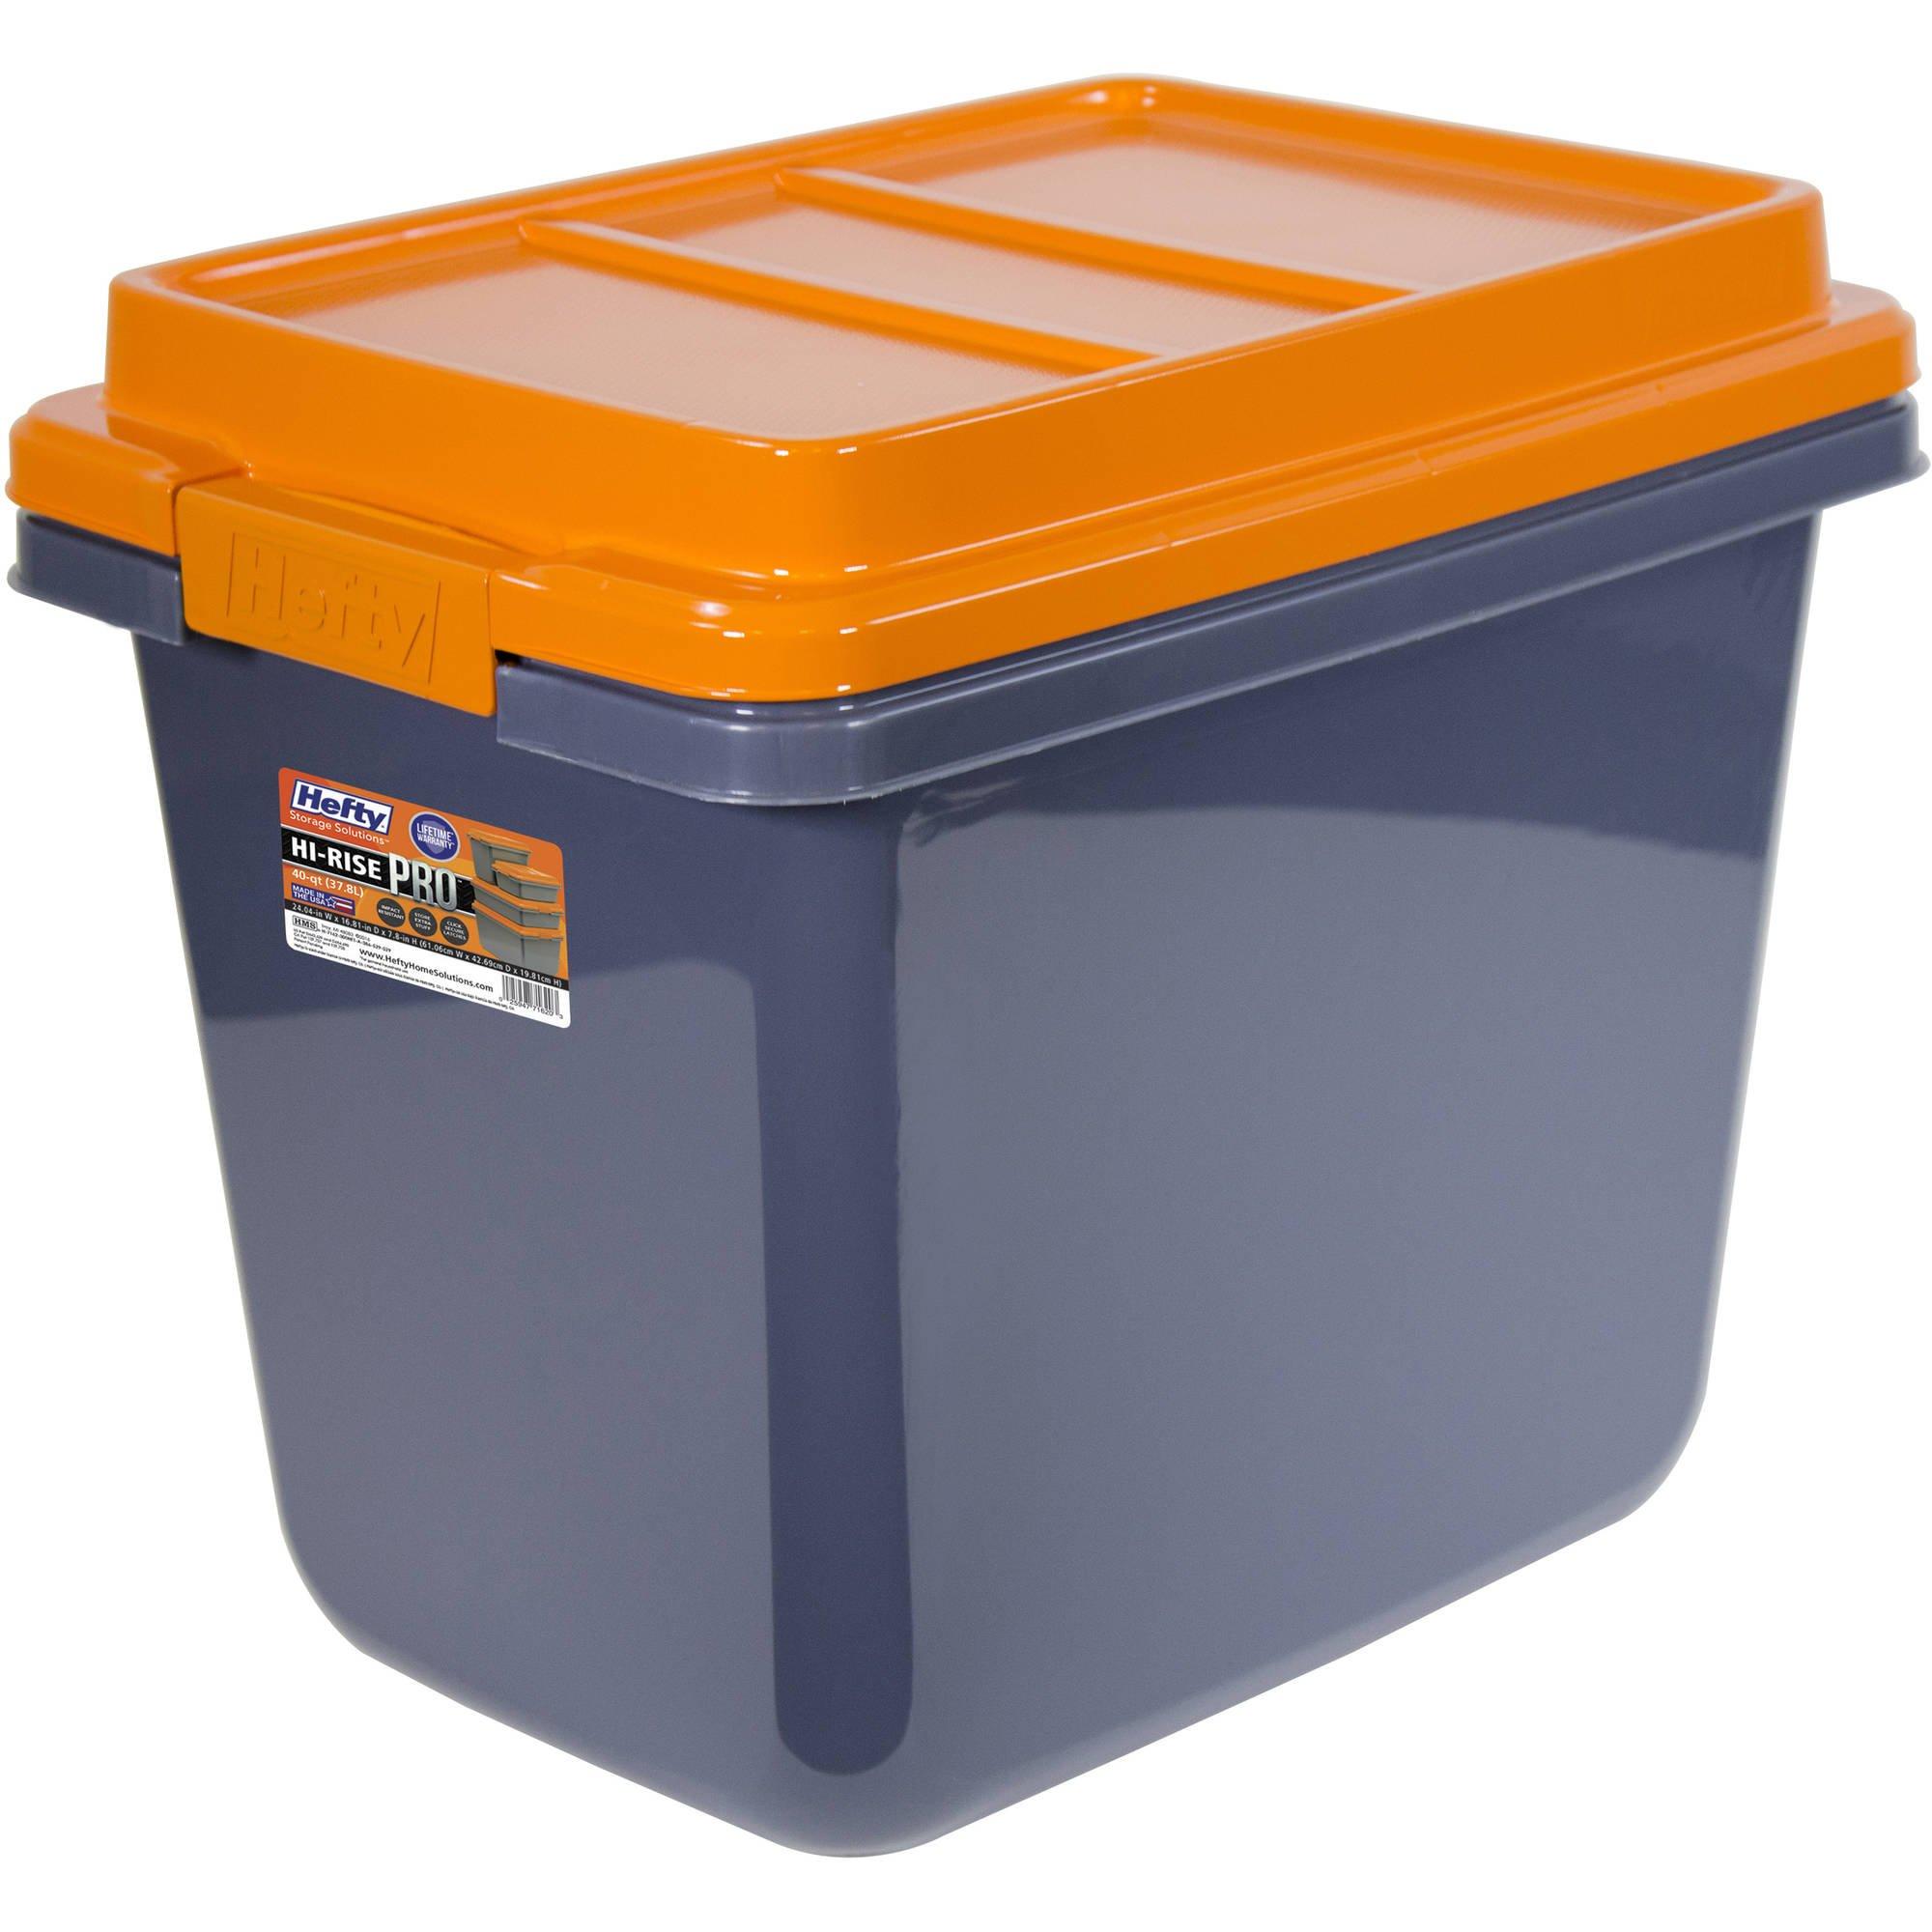 Hefty* Ultra-Strength HI-RISE Heavy Duty Storage Bins, 32 Qt. (9.3 Gal) Latch Storage Box, Orange/Gray by Hefty SET OF 3